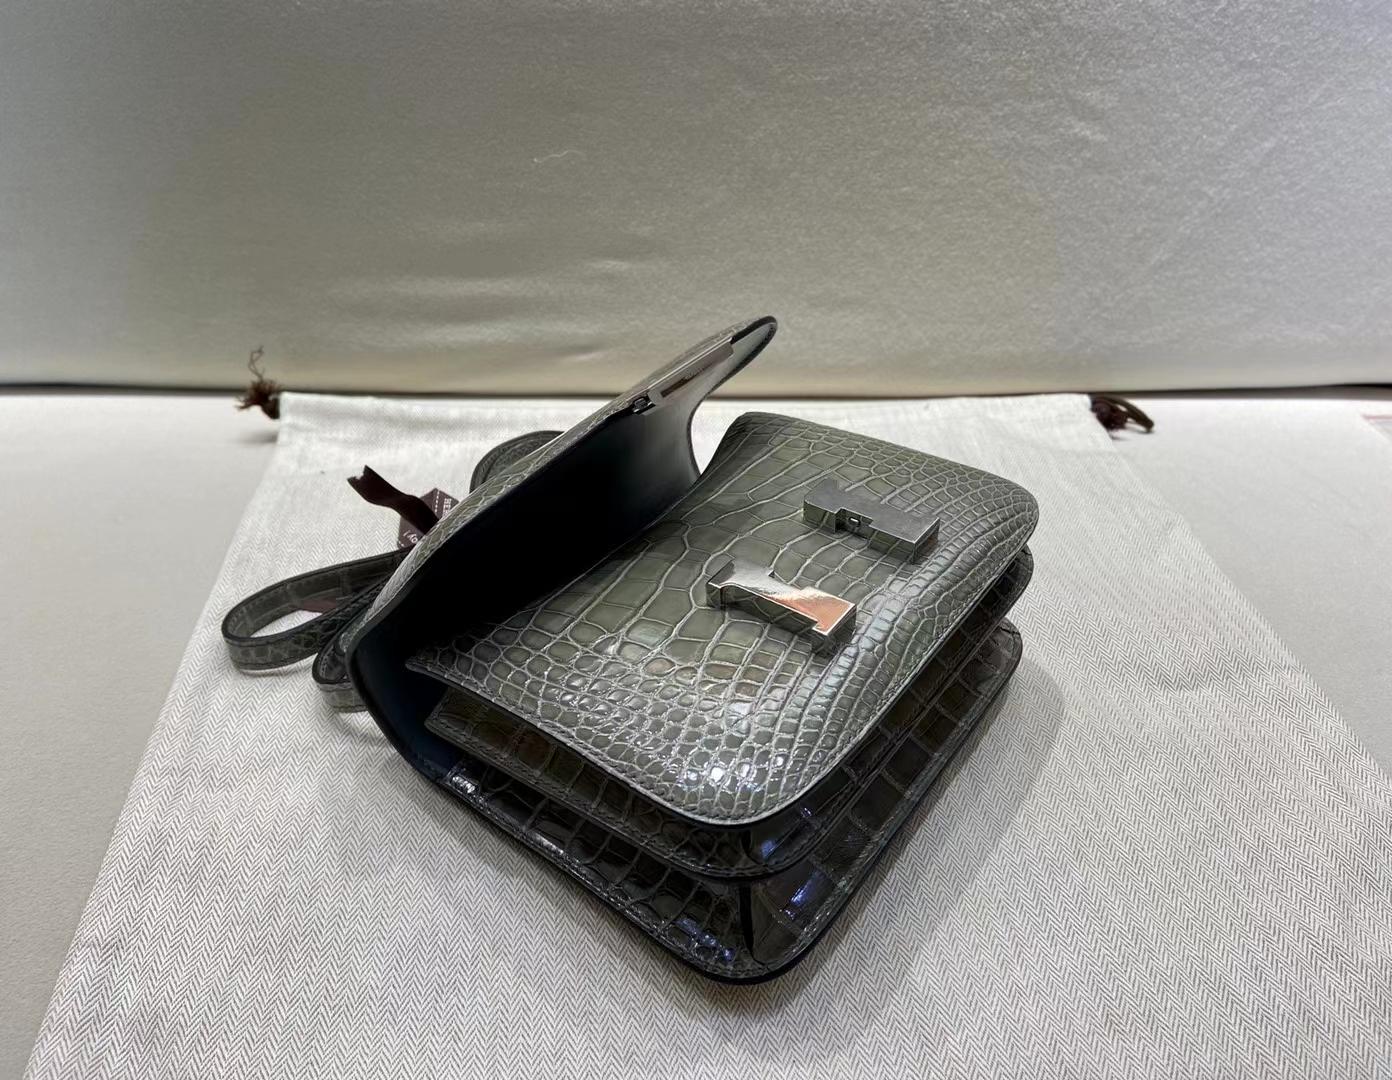 Hermès(爱马仕)Constance 19cm 银扣 亮面美洲鳄 斑鸠灰 顶级纯手工